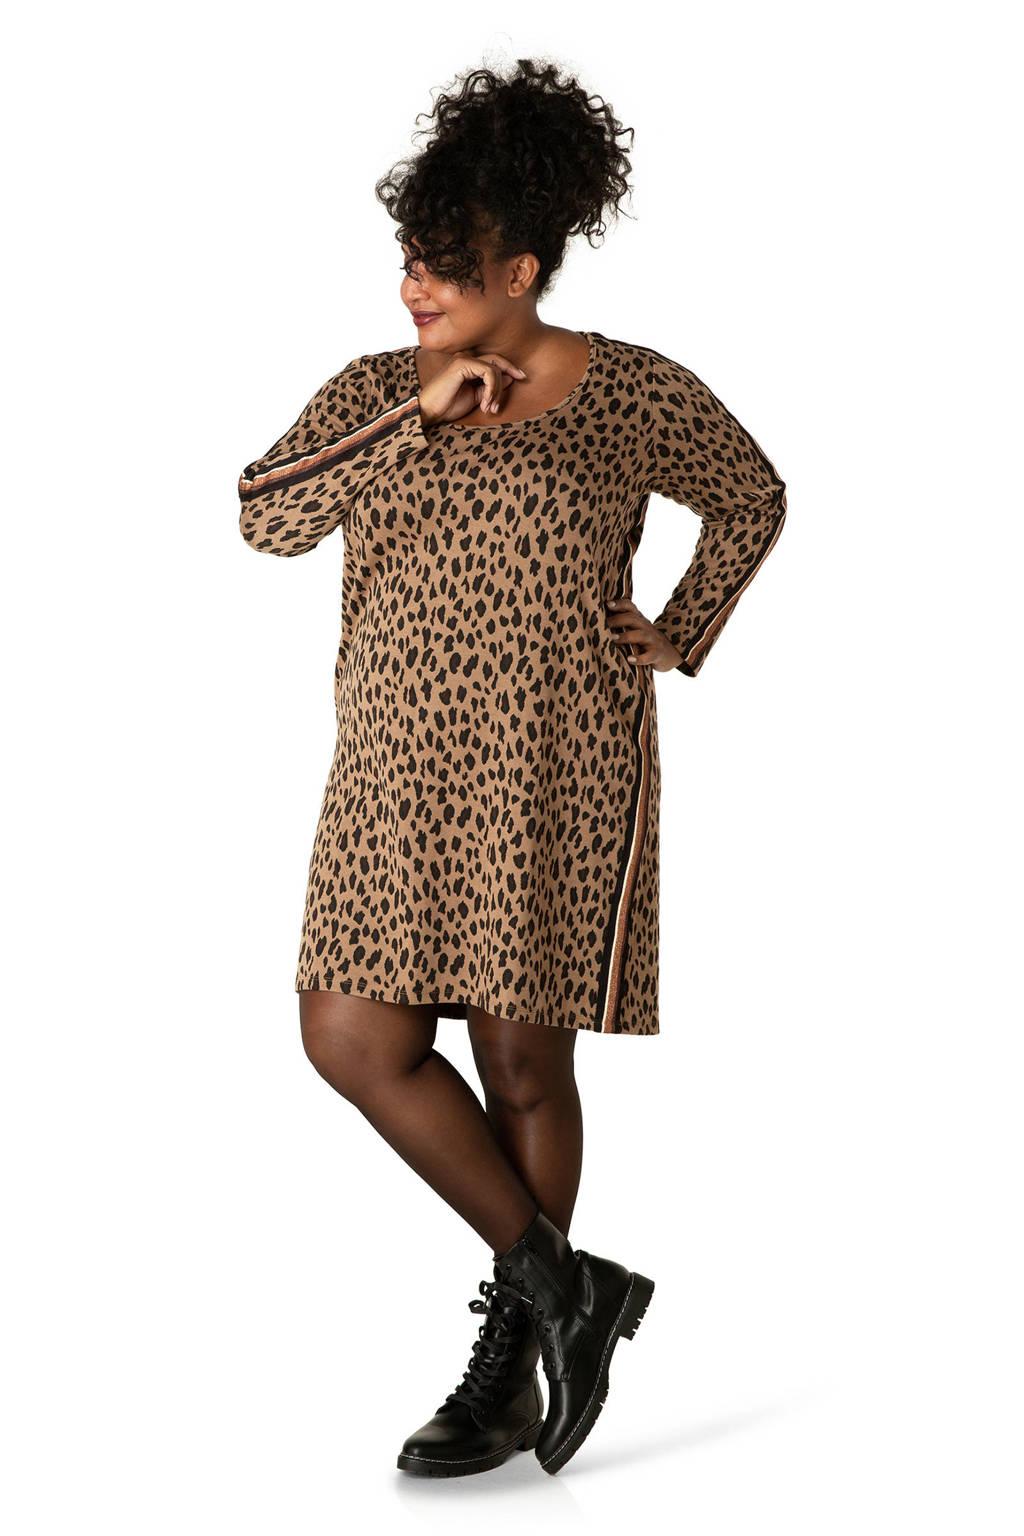 IVY BELLA jersey jurk met all over print camel/bruin/zwart, Camel/bruin/zwart